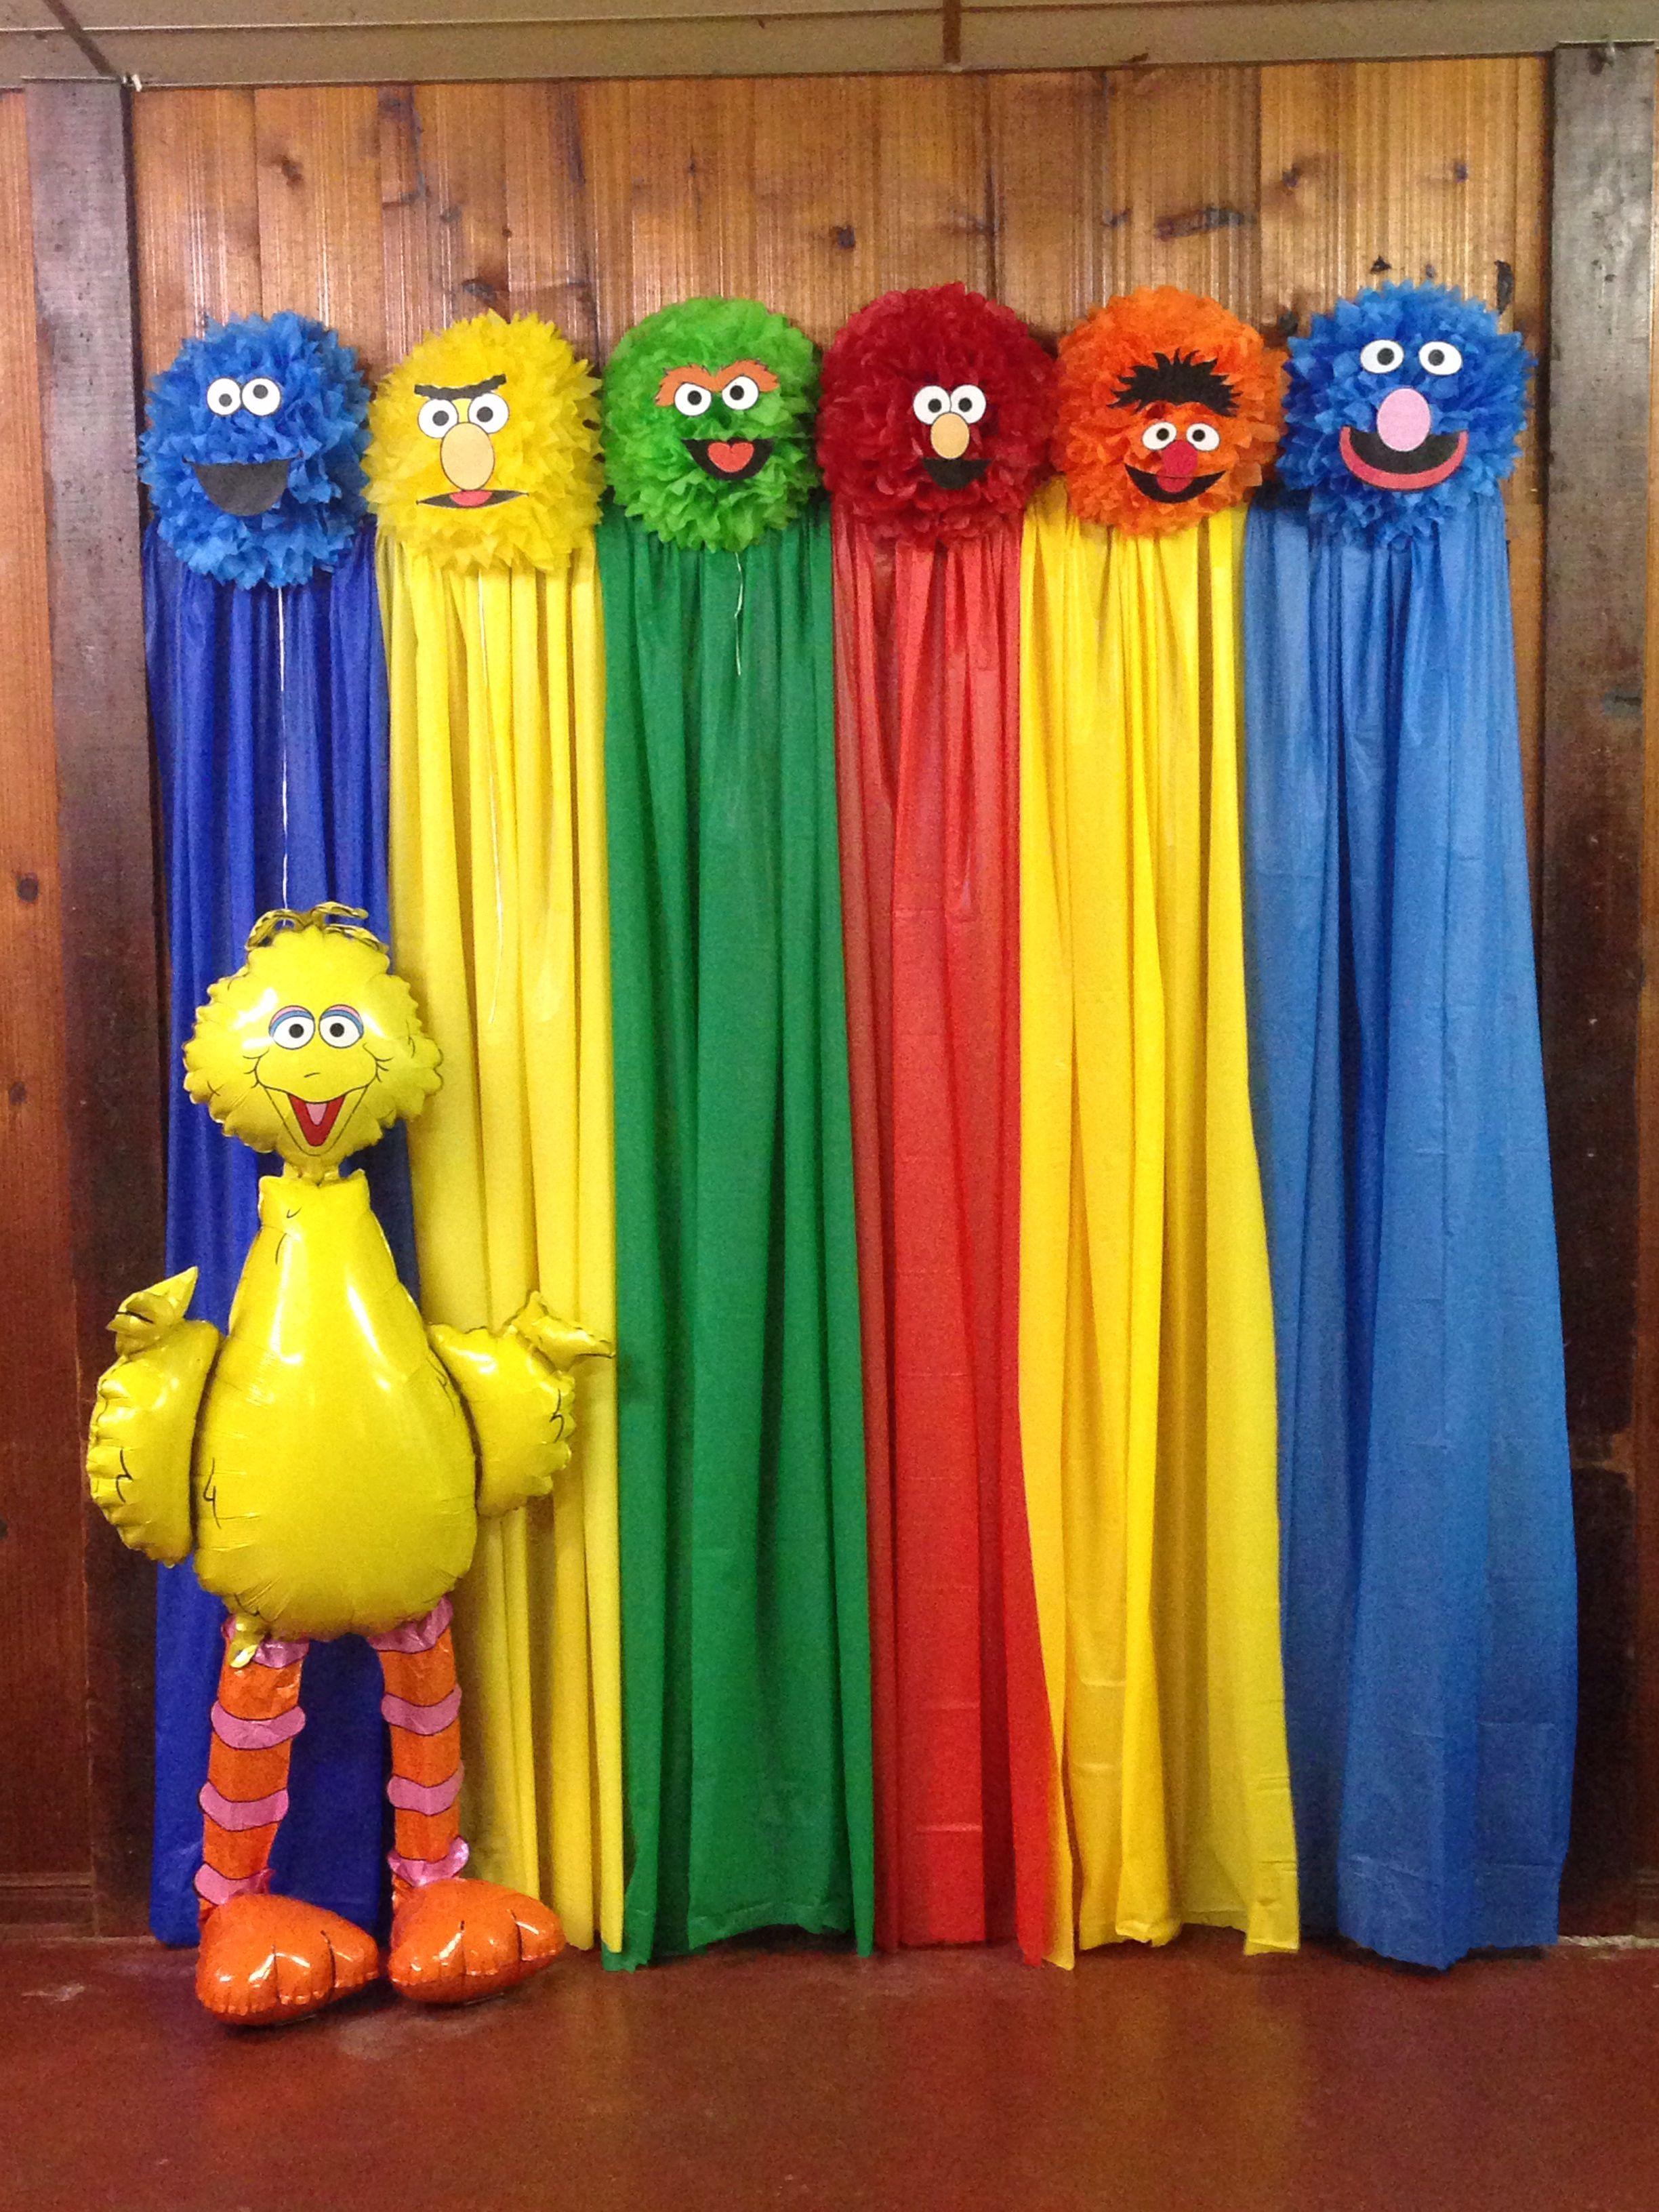 Sesame Street Photo Backdrop Sesame Street Birthday Party Ideas Boy Elmo Birthday Party Boy Sesame Street Birthday Party